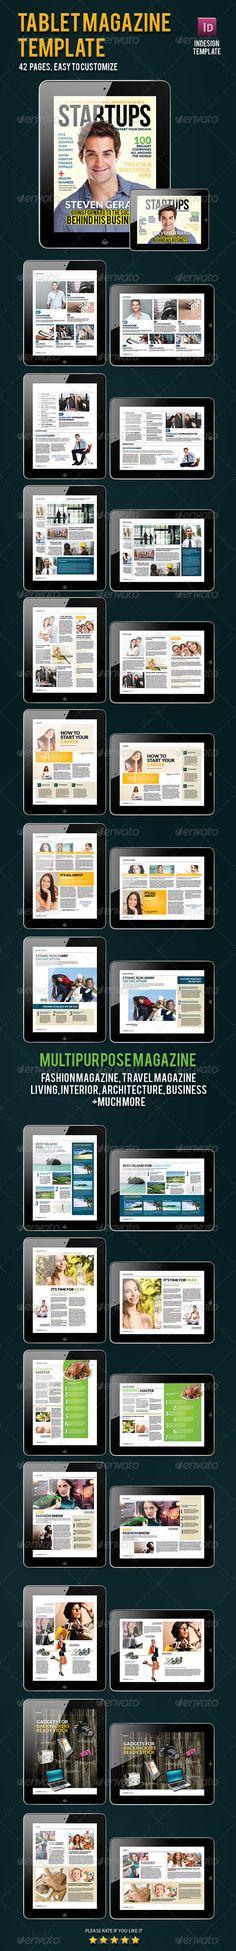 Magazine Template for Tablet - ePublishing